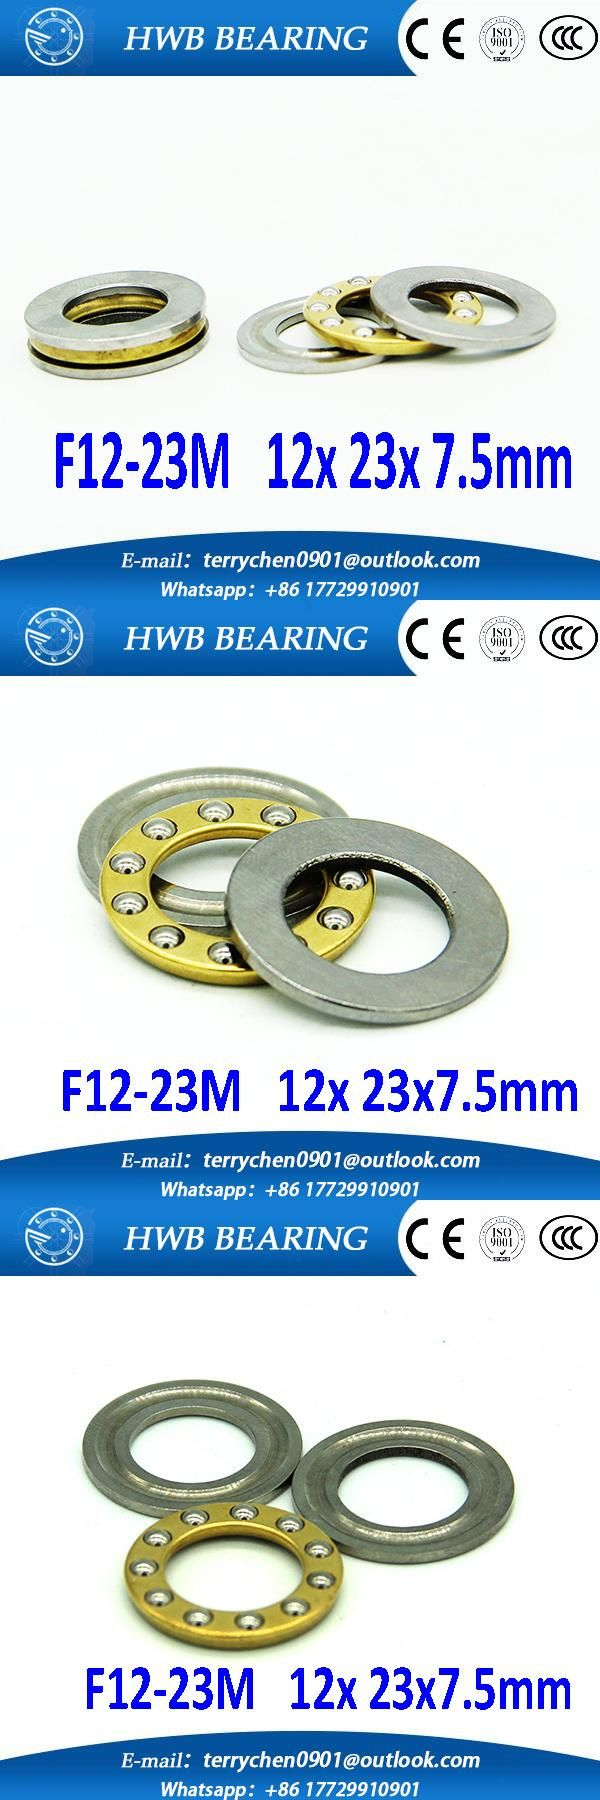 [Visit to Buy] Free shipping 10Pcs F12-23M Axial Ball Thrust Bearings 12 x 23 x 7.5mm    Plane thrust ball bearings  for 12mm shaft 12*23*7.5mm #Advertisement